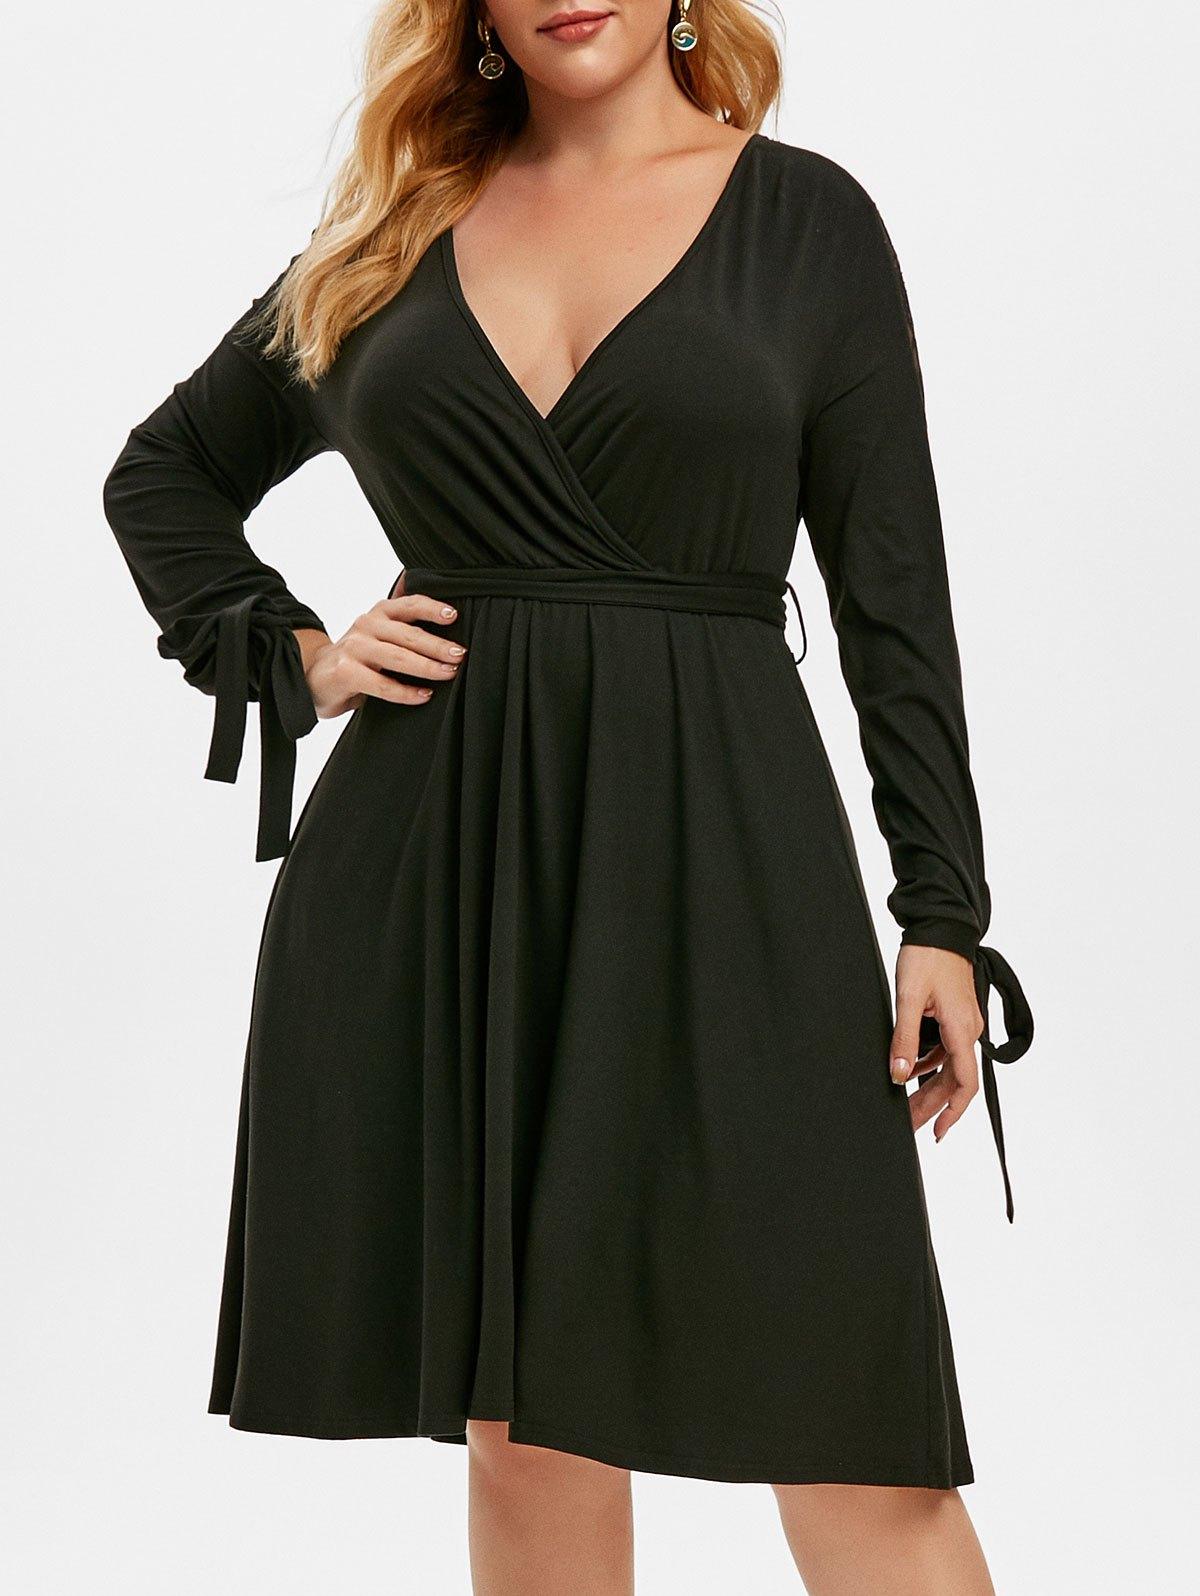 Plus Size Plunge Lace Panel Tie Sleeve Dress